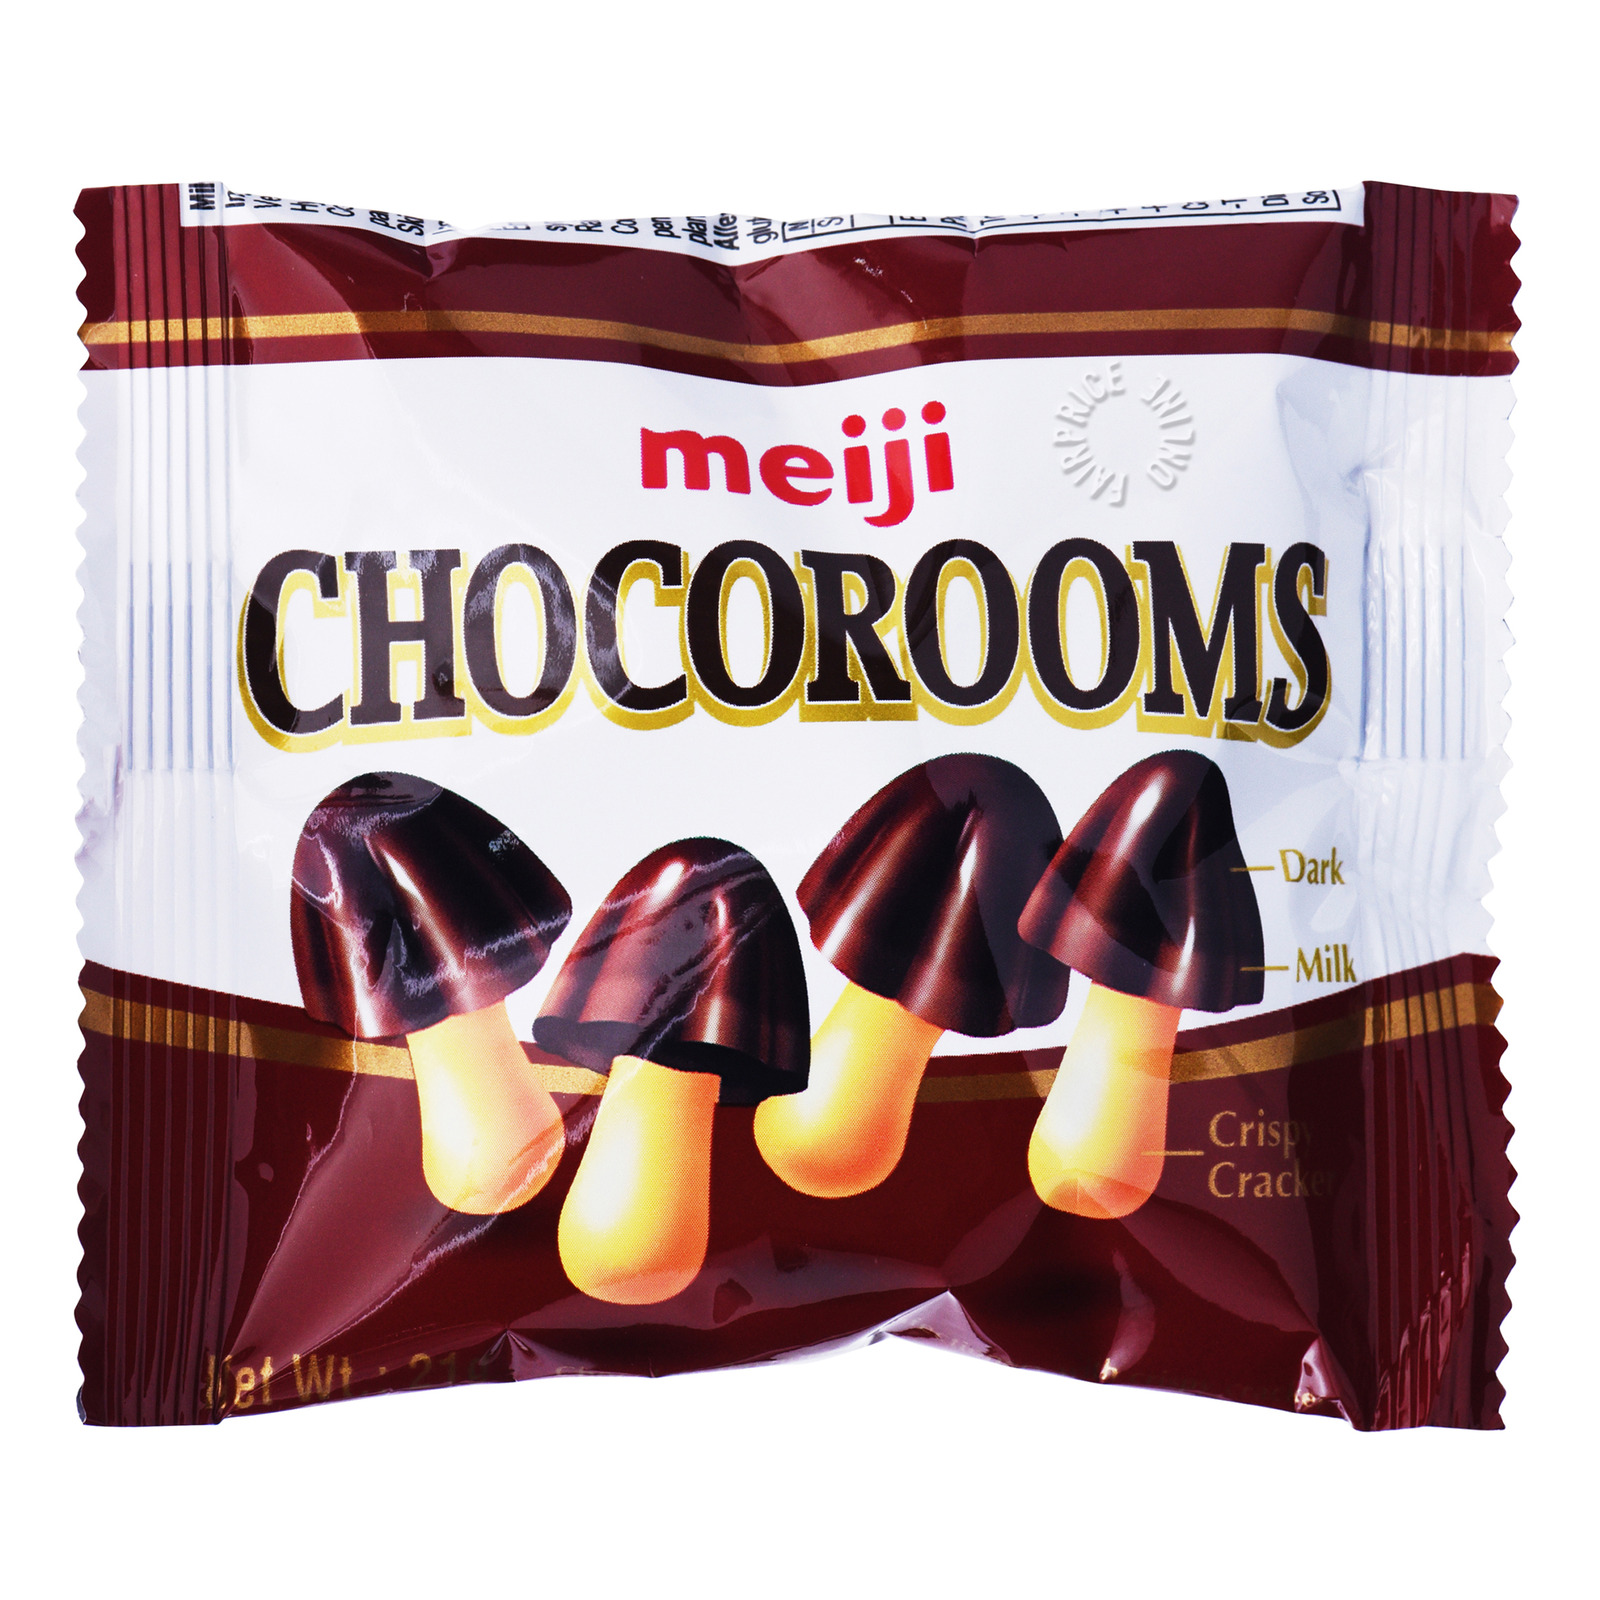 Meiji Chocorooms Crispy Cracker